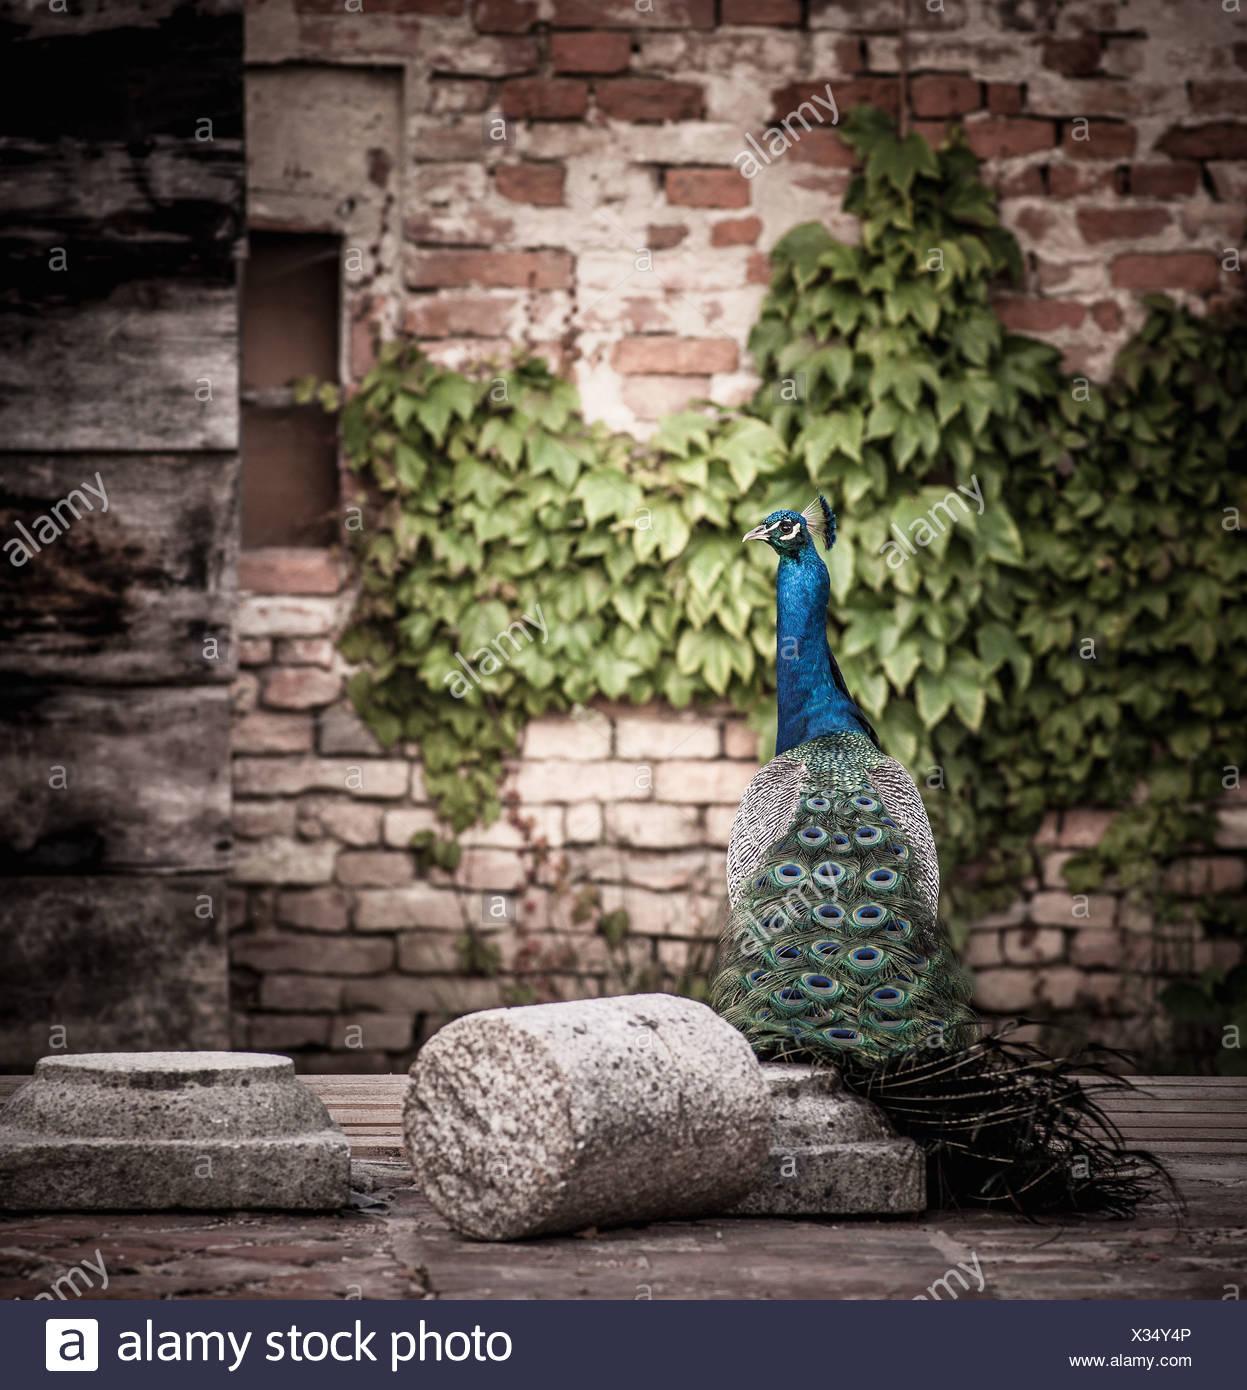 Peacock sitting on concrete platform - Stock Image